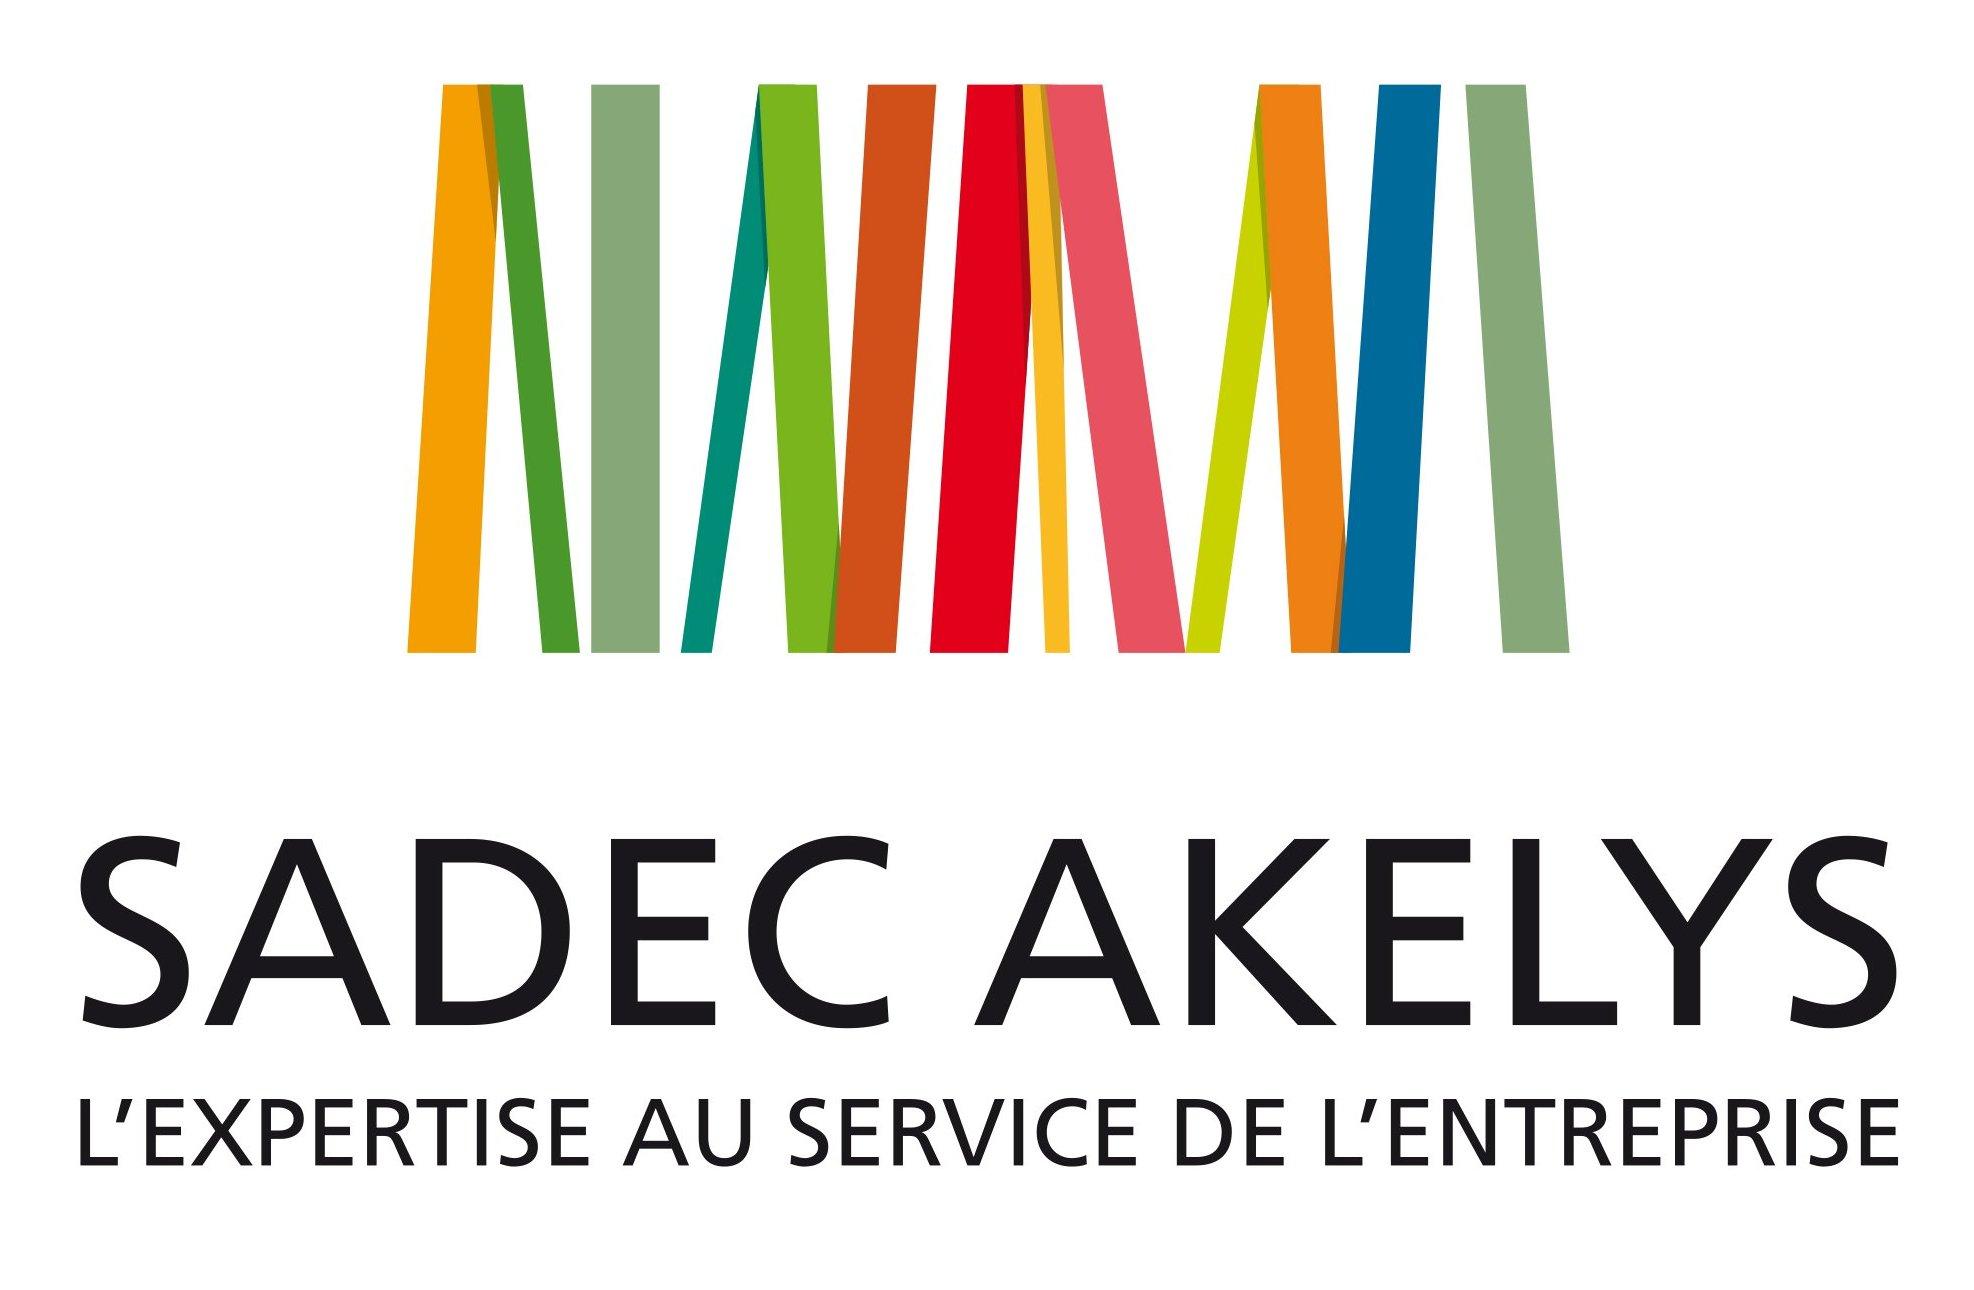 http://www.ecuriegentianehistorique.fr/wp-content/uploads/2016/01/81-logosadecakelys2015.jpg